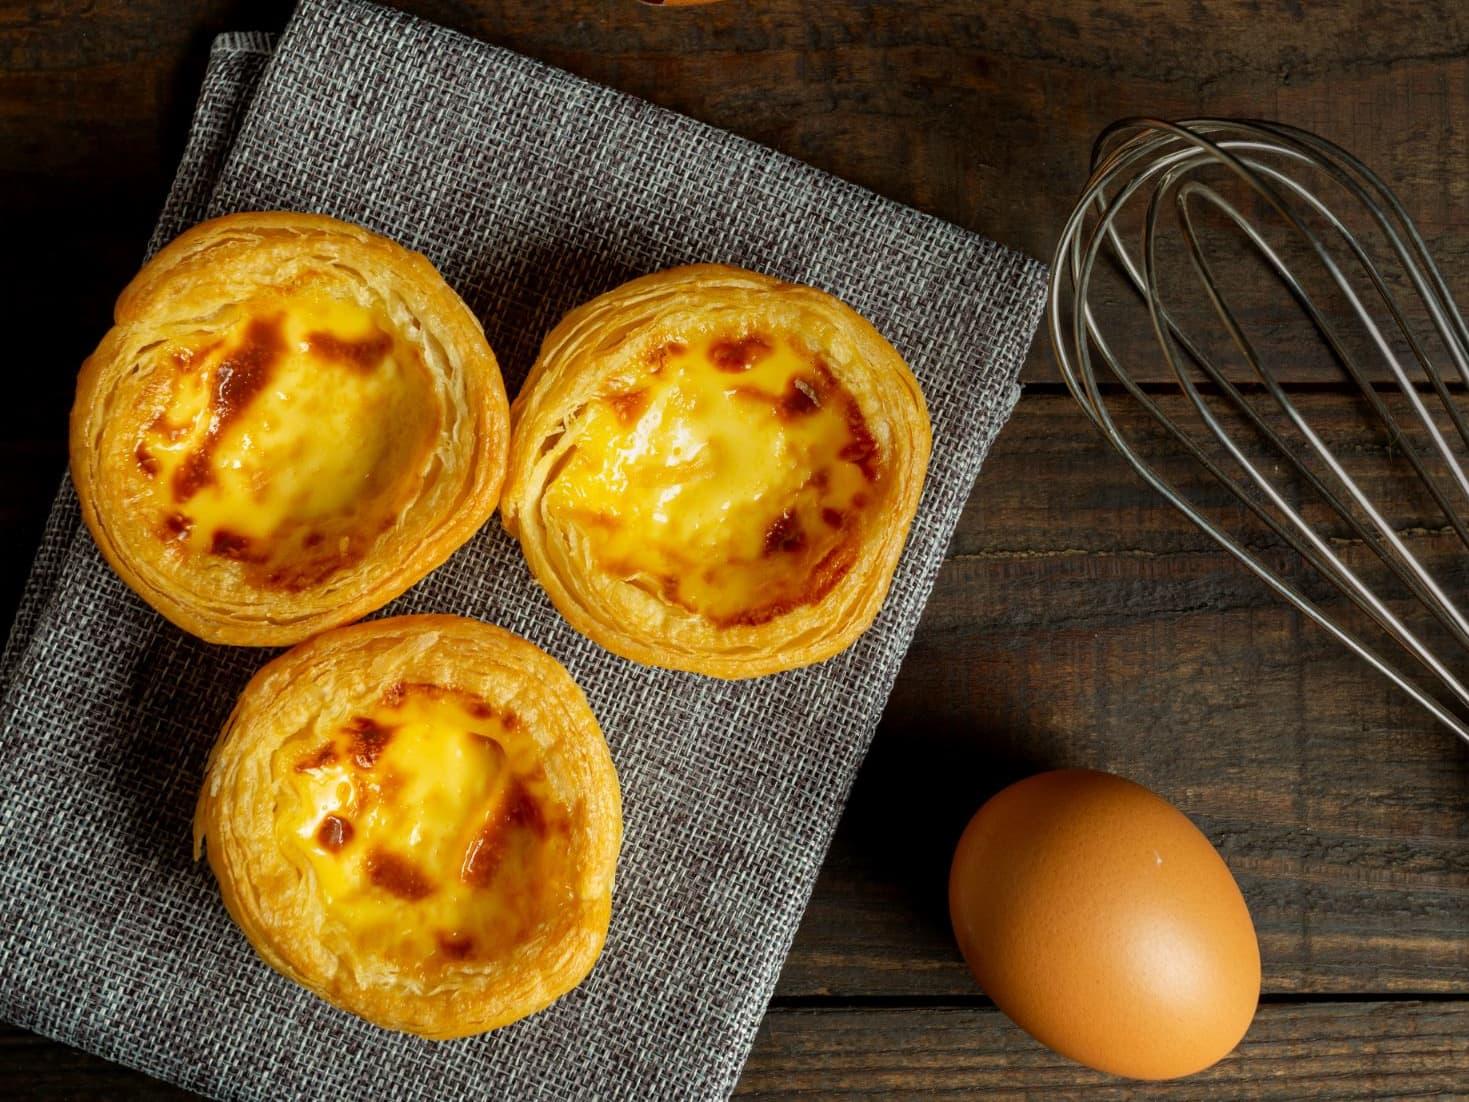 8 x Portuguese Egg Tart